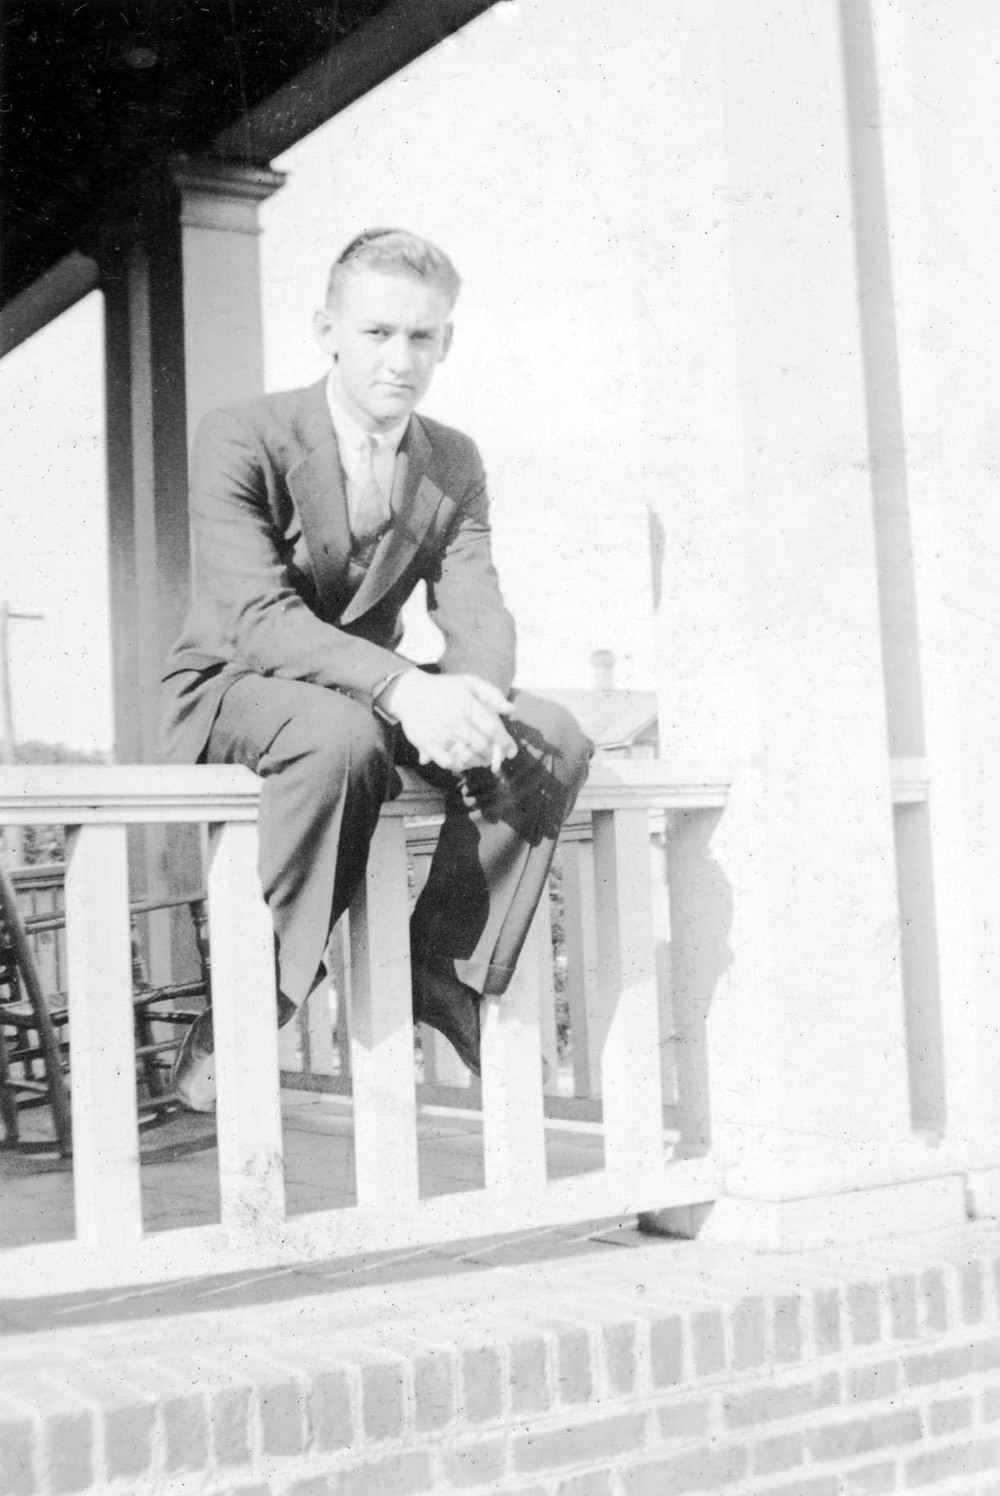 Donald B. Livingstone 1939 - Dillsburg, PA